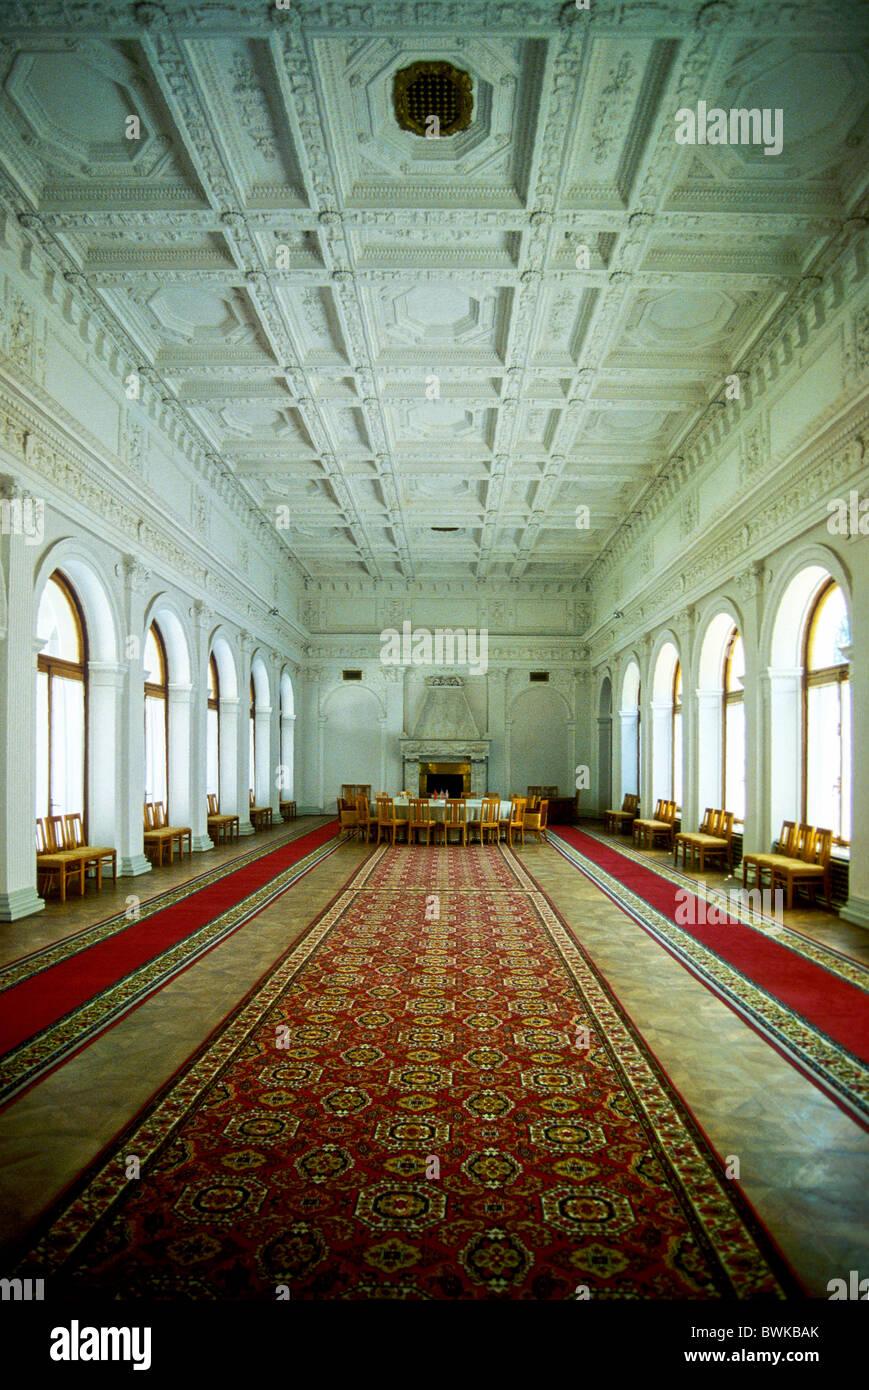 Ukraine Crimea Yalta Jalta Liwadija palace inside hall carpets wall hangings architecture conference blank - Stock Image